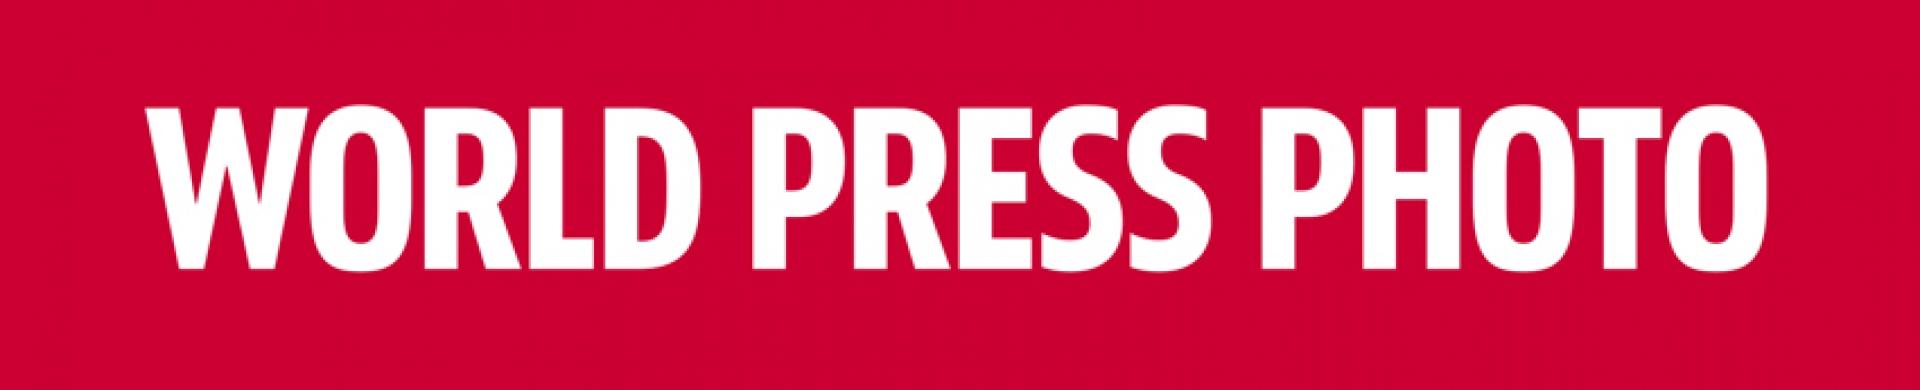 WorldPressPhoto17_Logo (c) WorldPressPhoto